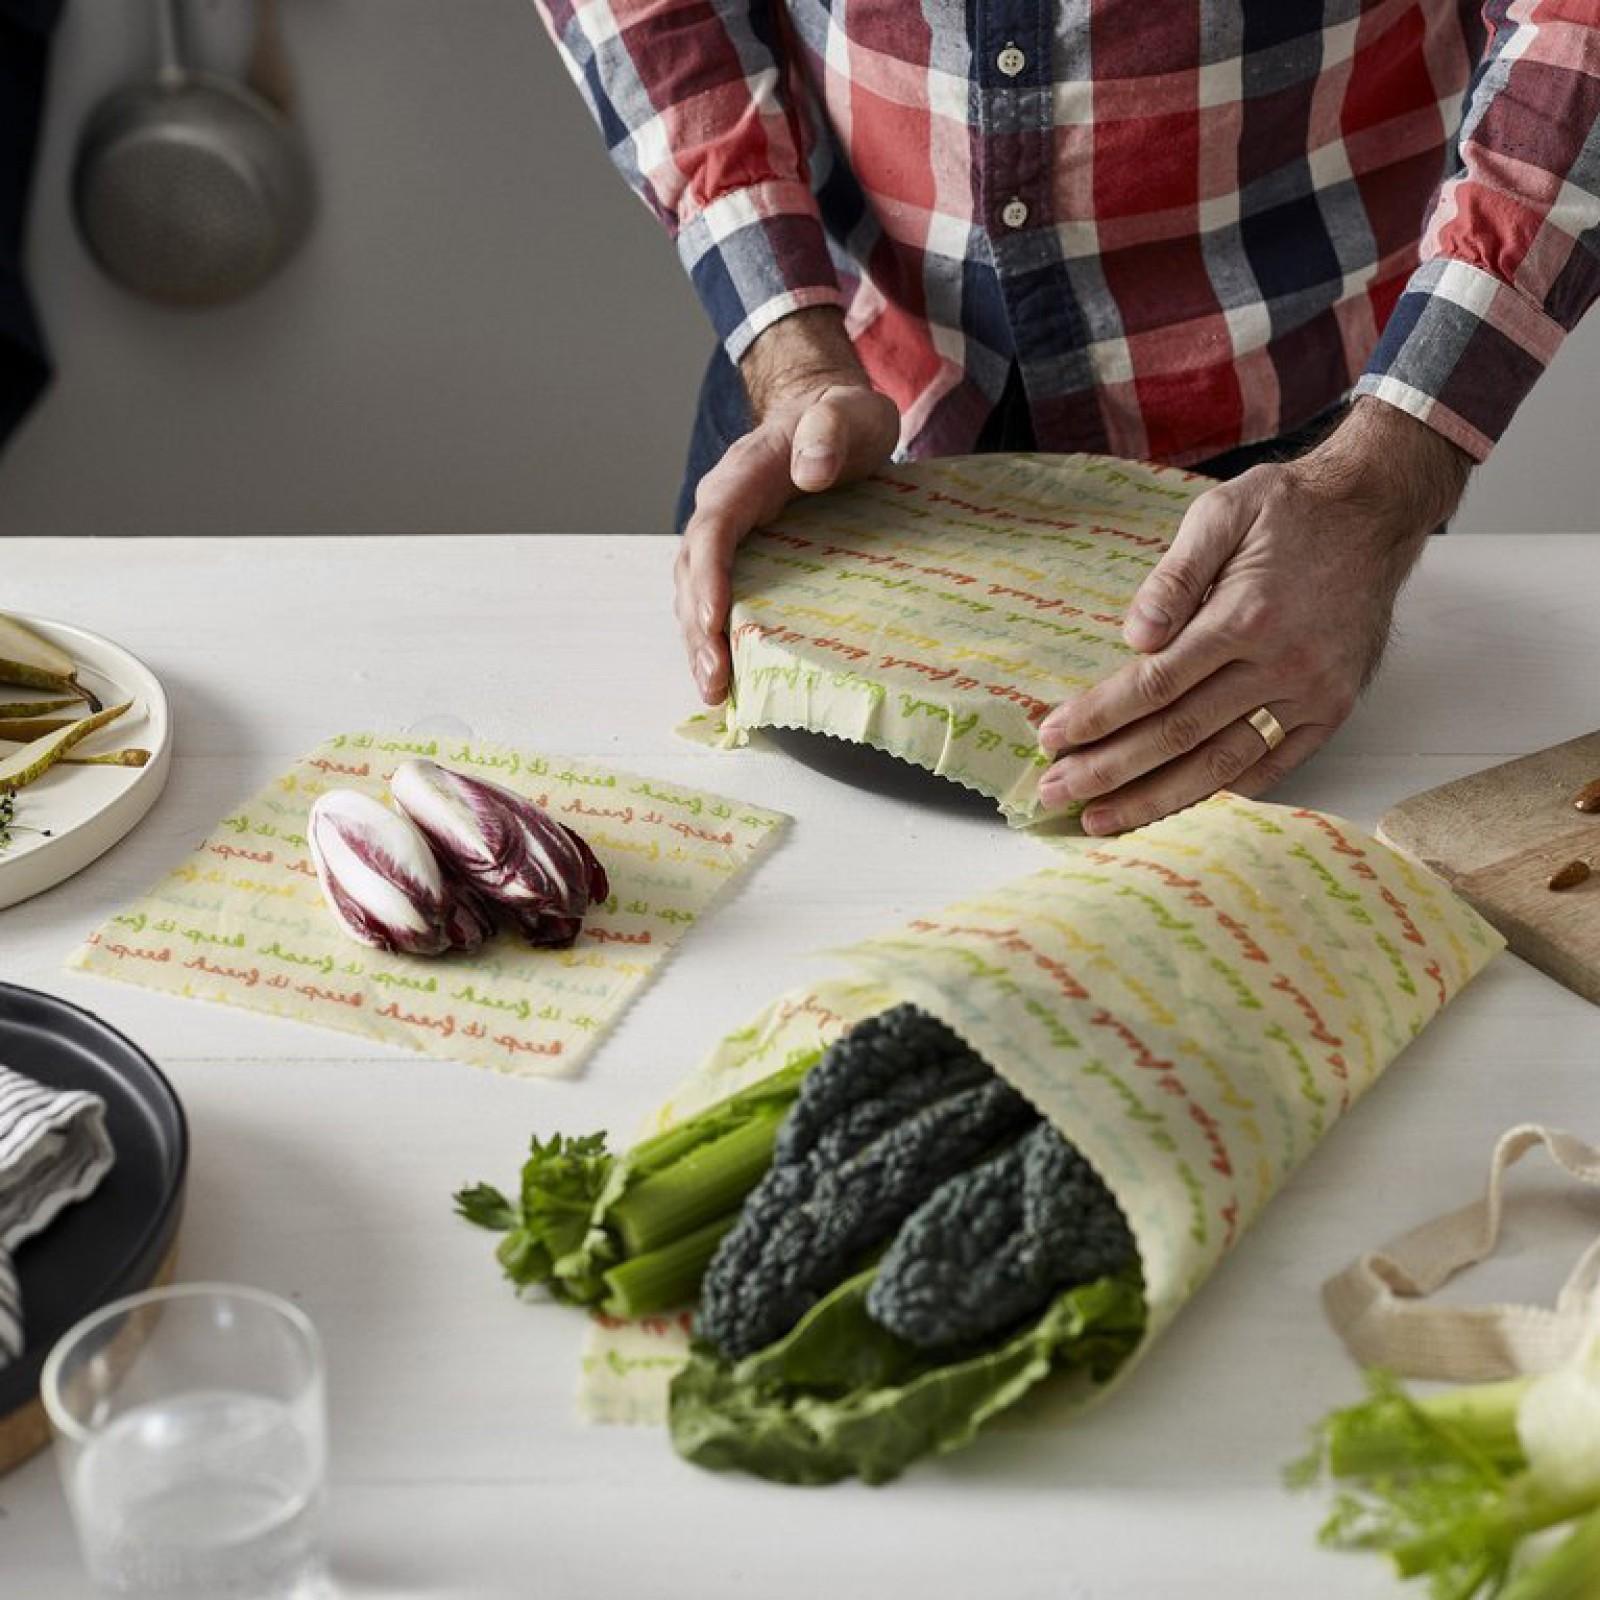 Vegan Food Wraps Medium Kitchen Pack The Waste Reduction Shop